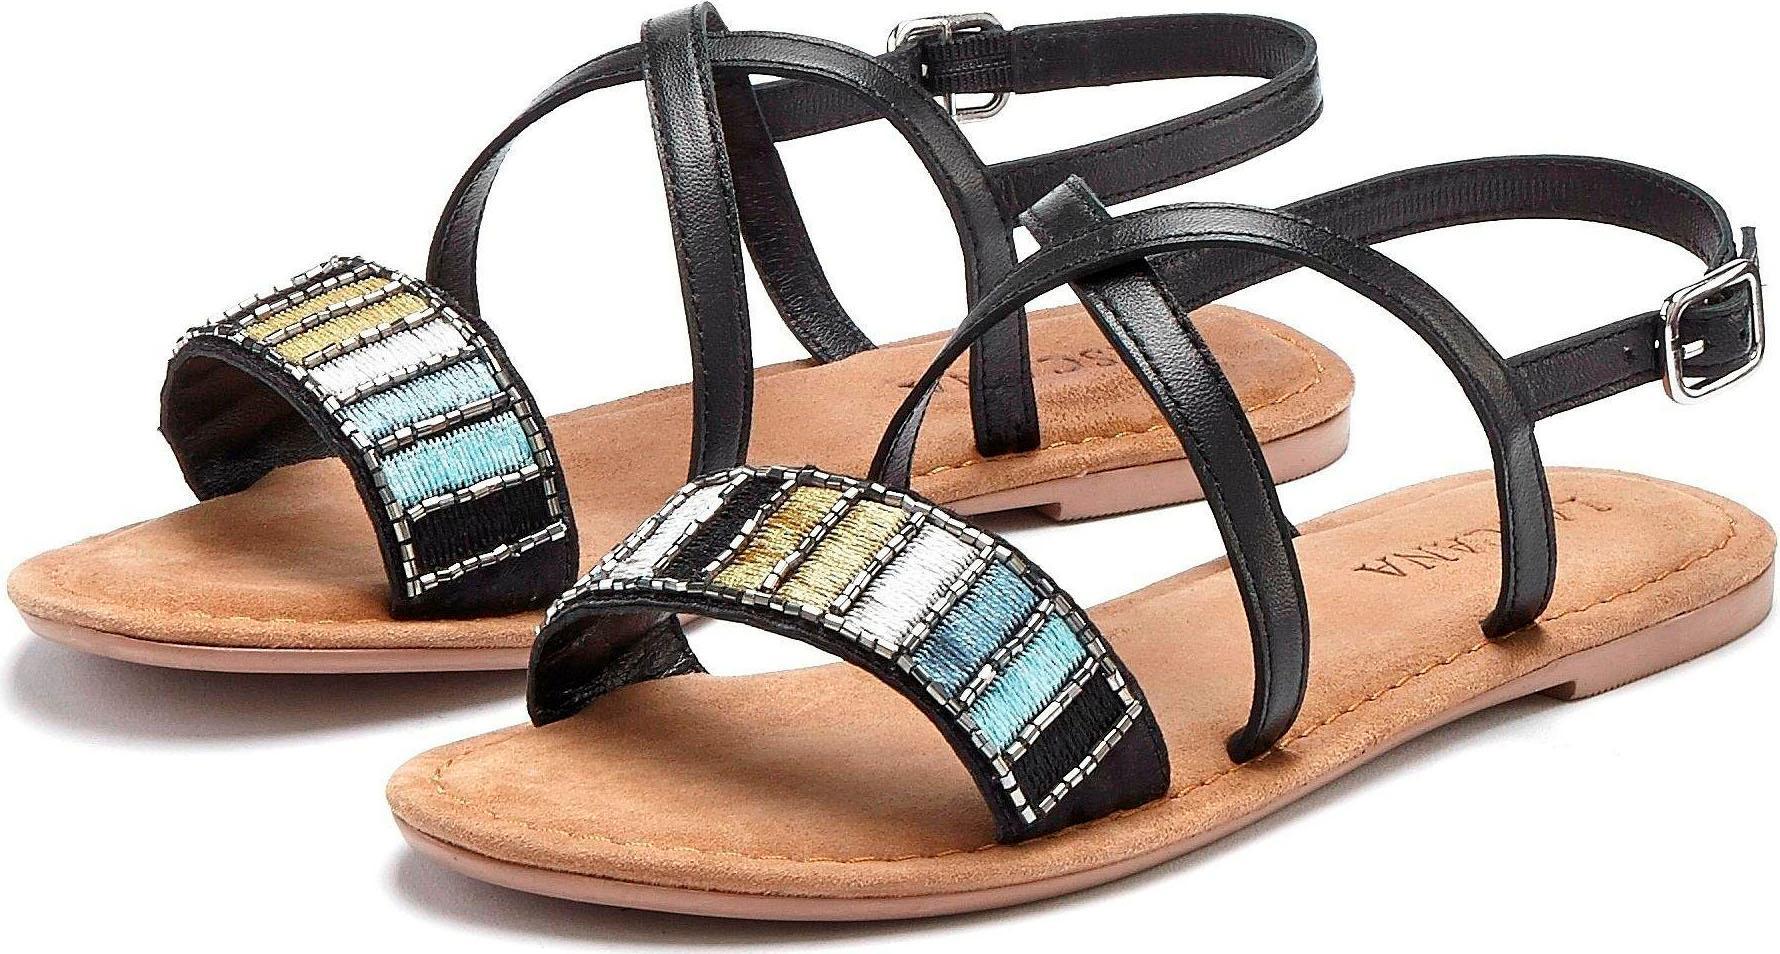 LASCANA Sandale Schuhe/Damenschuhe/Sandalen/Sandalen